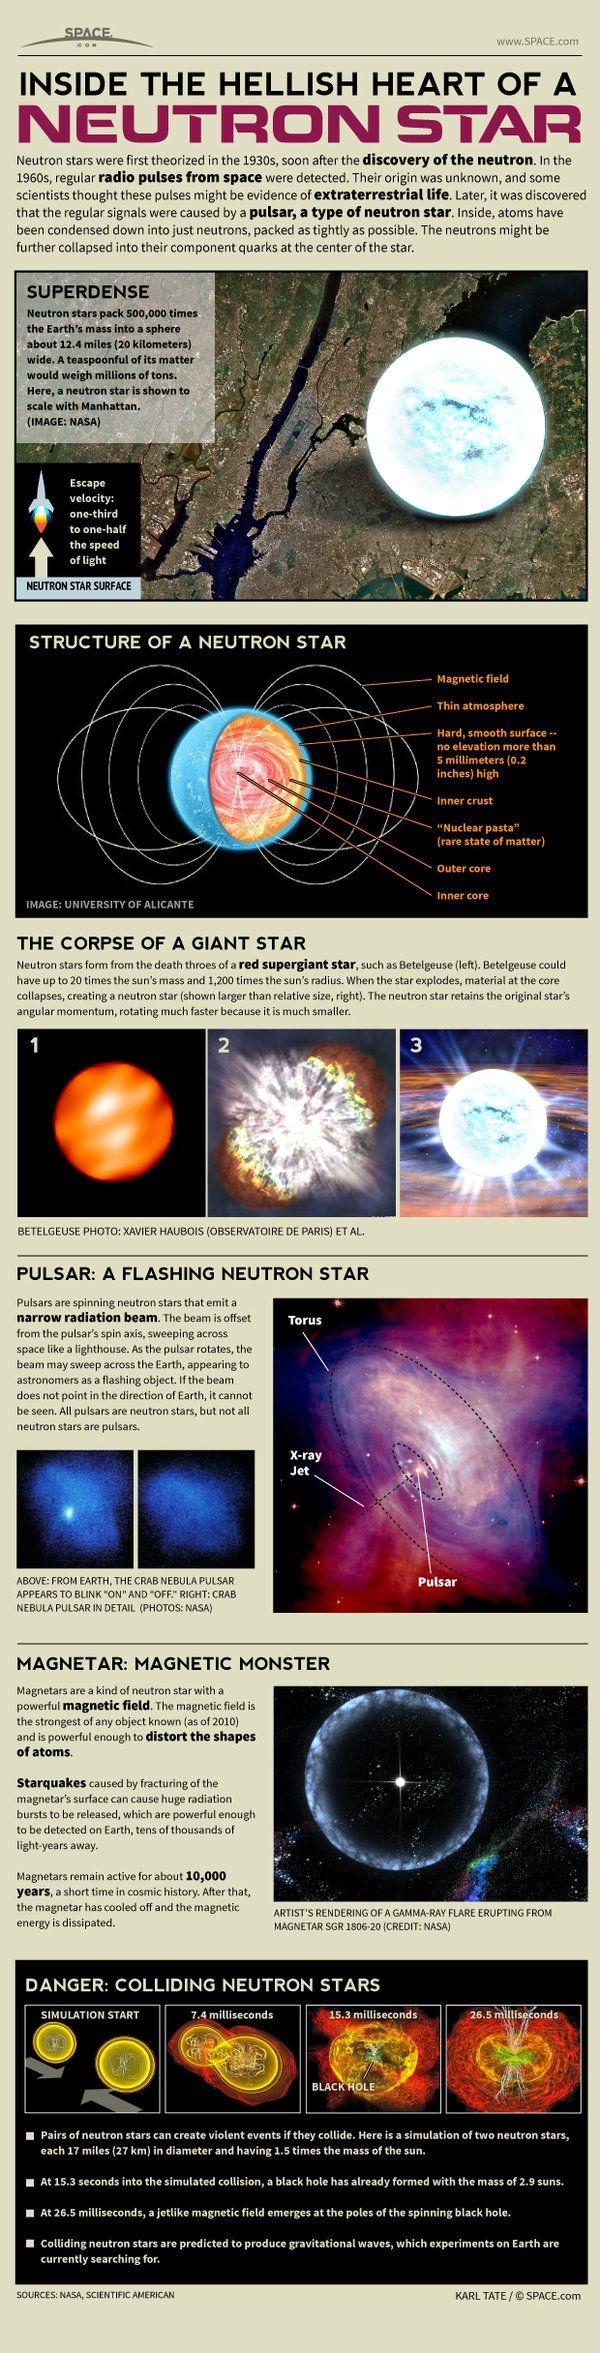 Inside a Neutron Star (Infographic)